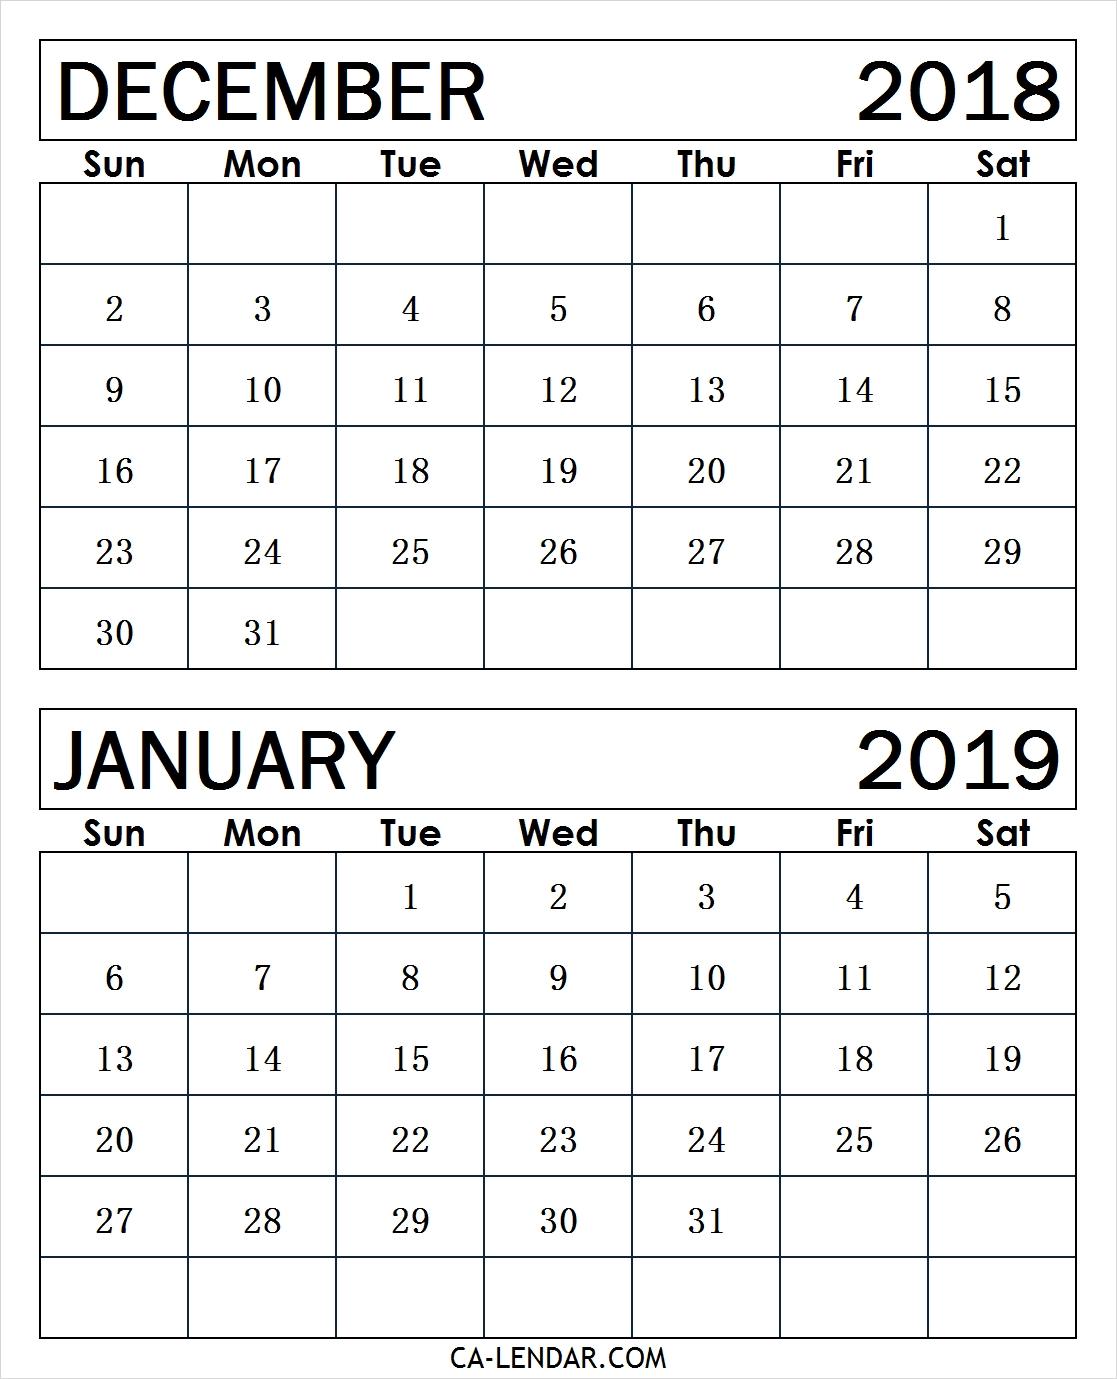 Printable Calendar Dec 2018 Jan 2019 | Printable Calendar 2019 intended for Calendar Images From Jan To Dec